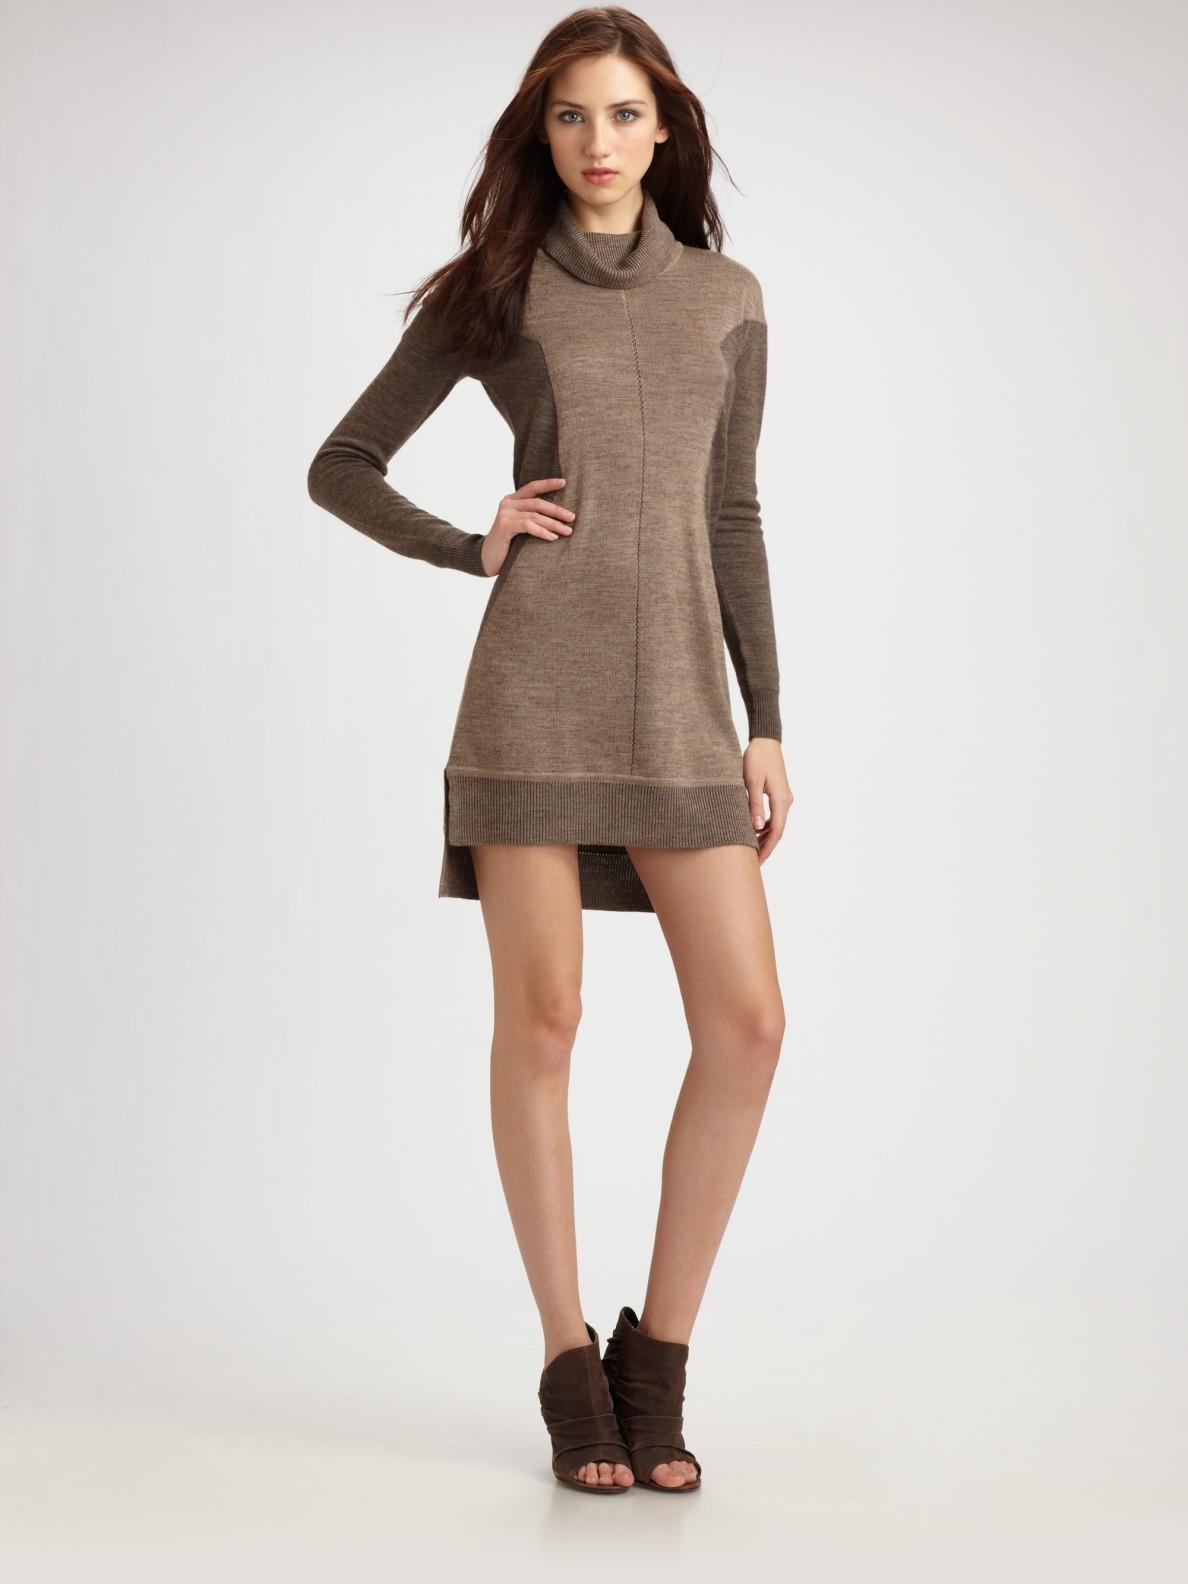 Bcbgmaxazria Turtleneck Wool Sweater Dress in Brown | Lyst